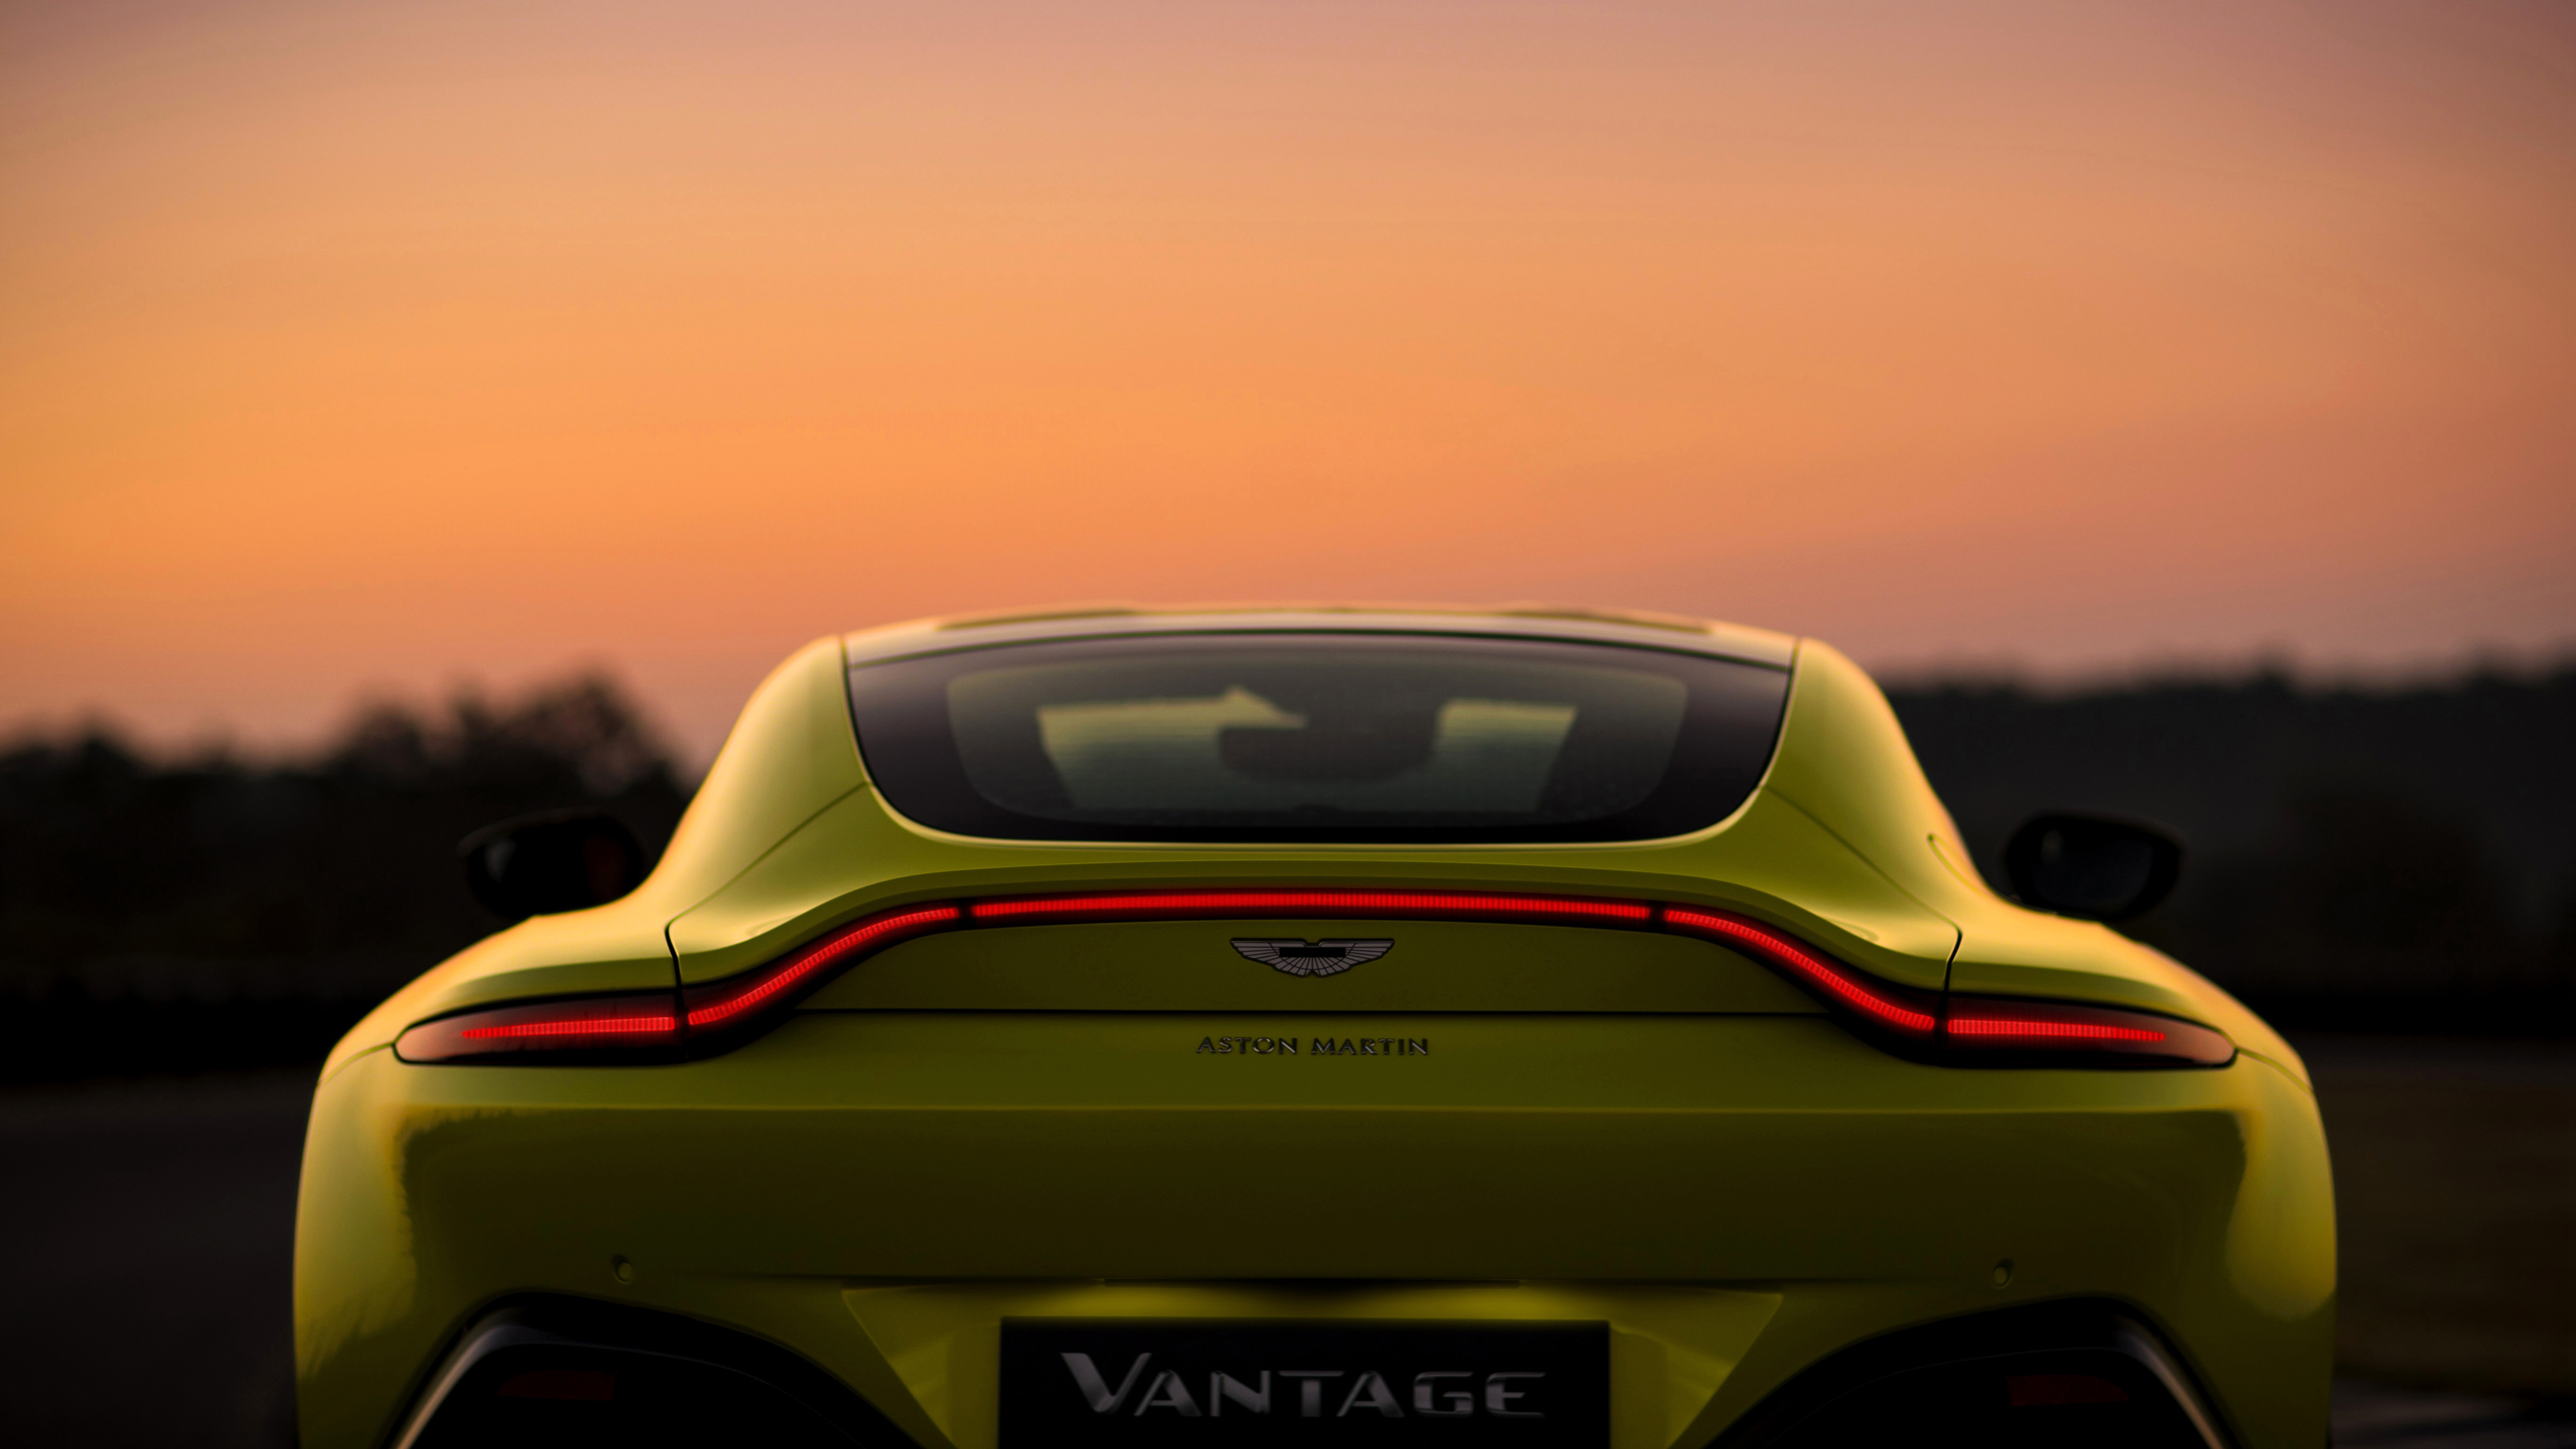 Free Download 2018 Aston Martin Vantage 4k Wallpapers Hd